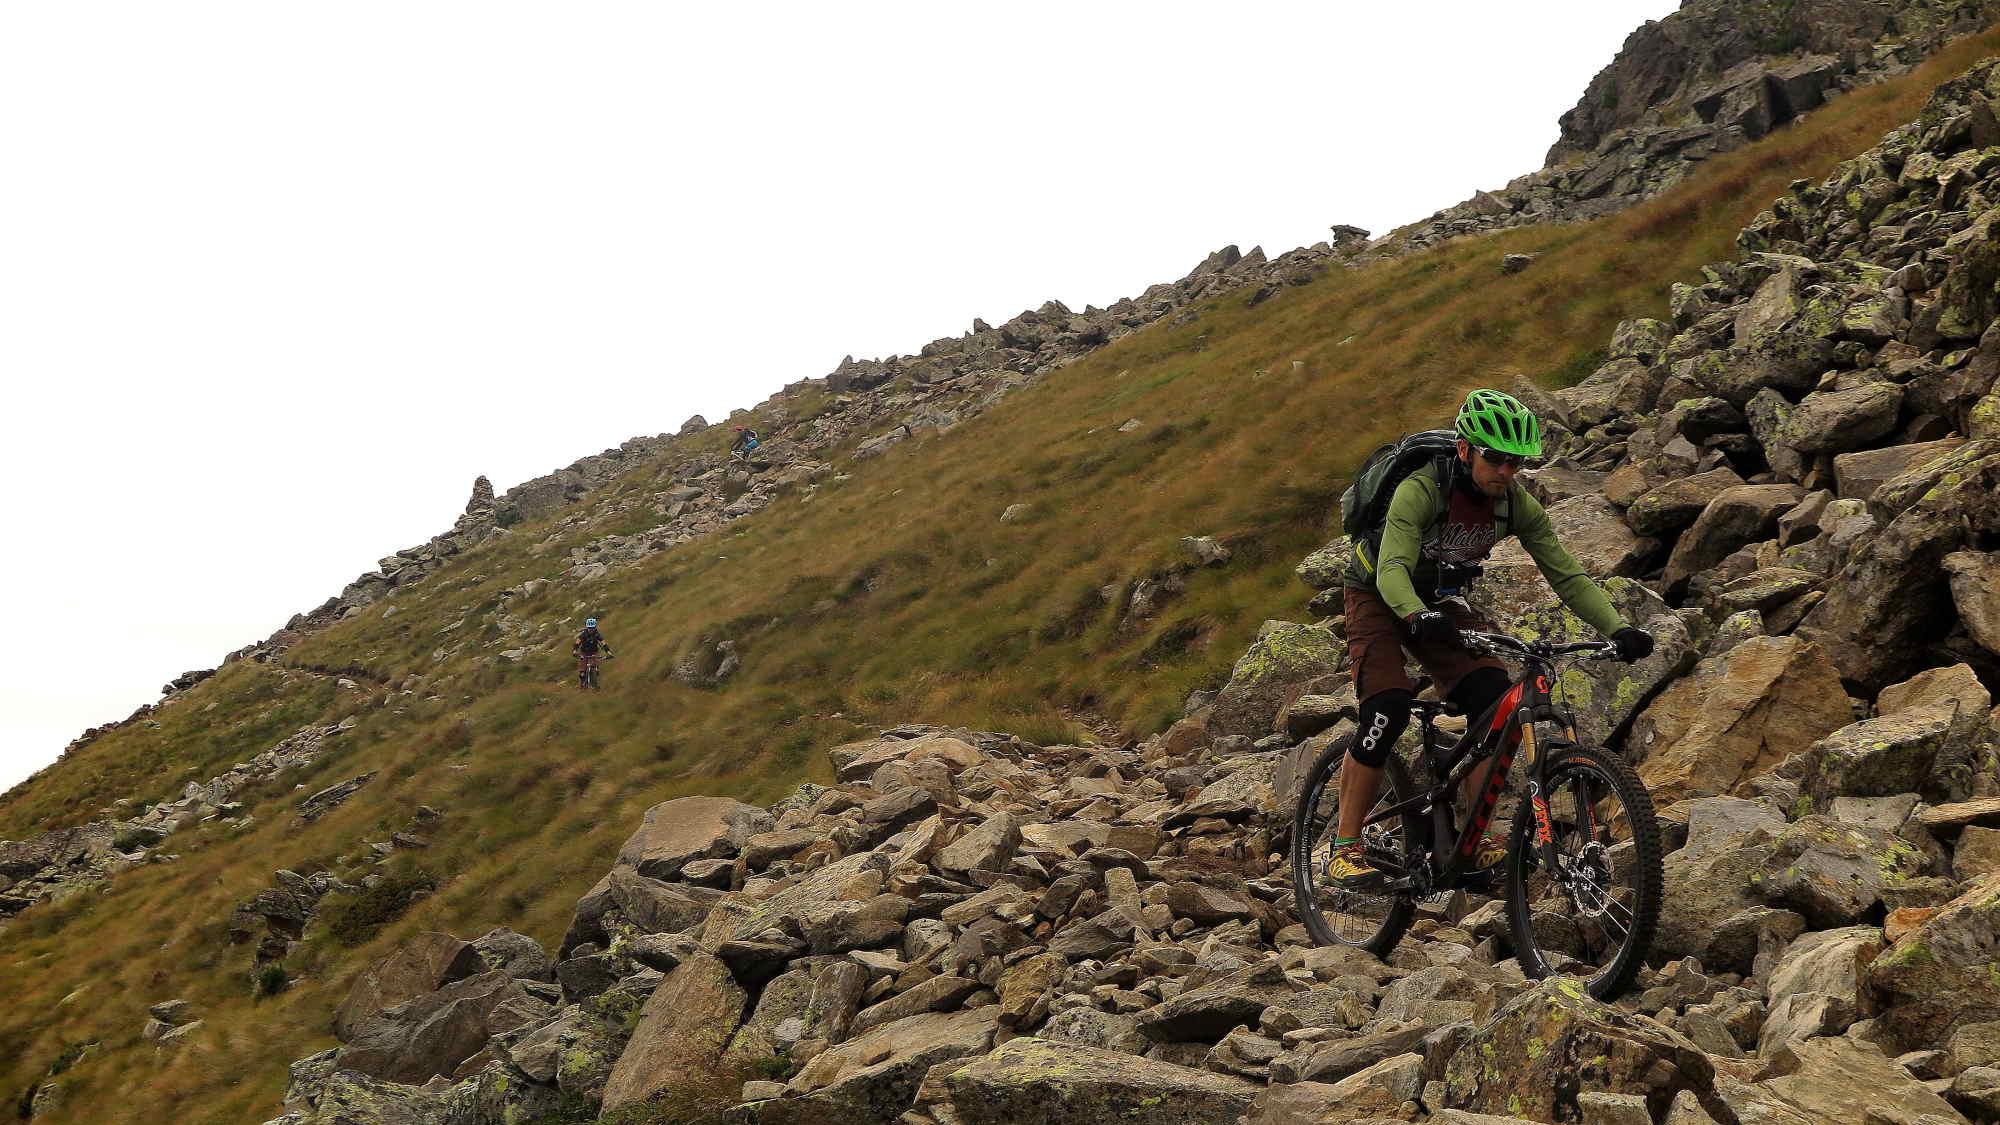 Ride Alpine Trails Mountainbike Freeride & Enduro Camp MTB Freeride Alta Rezia Ride on